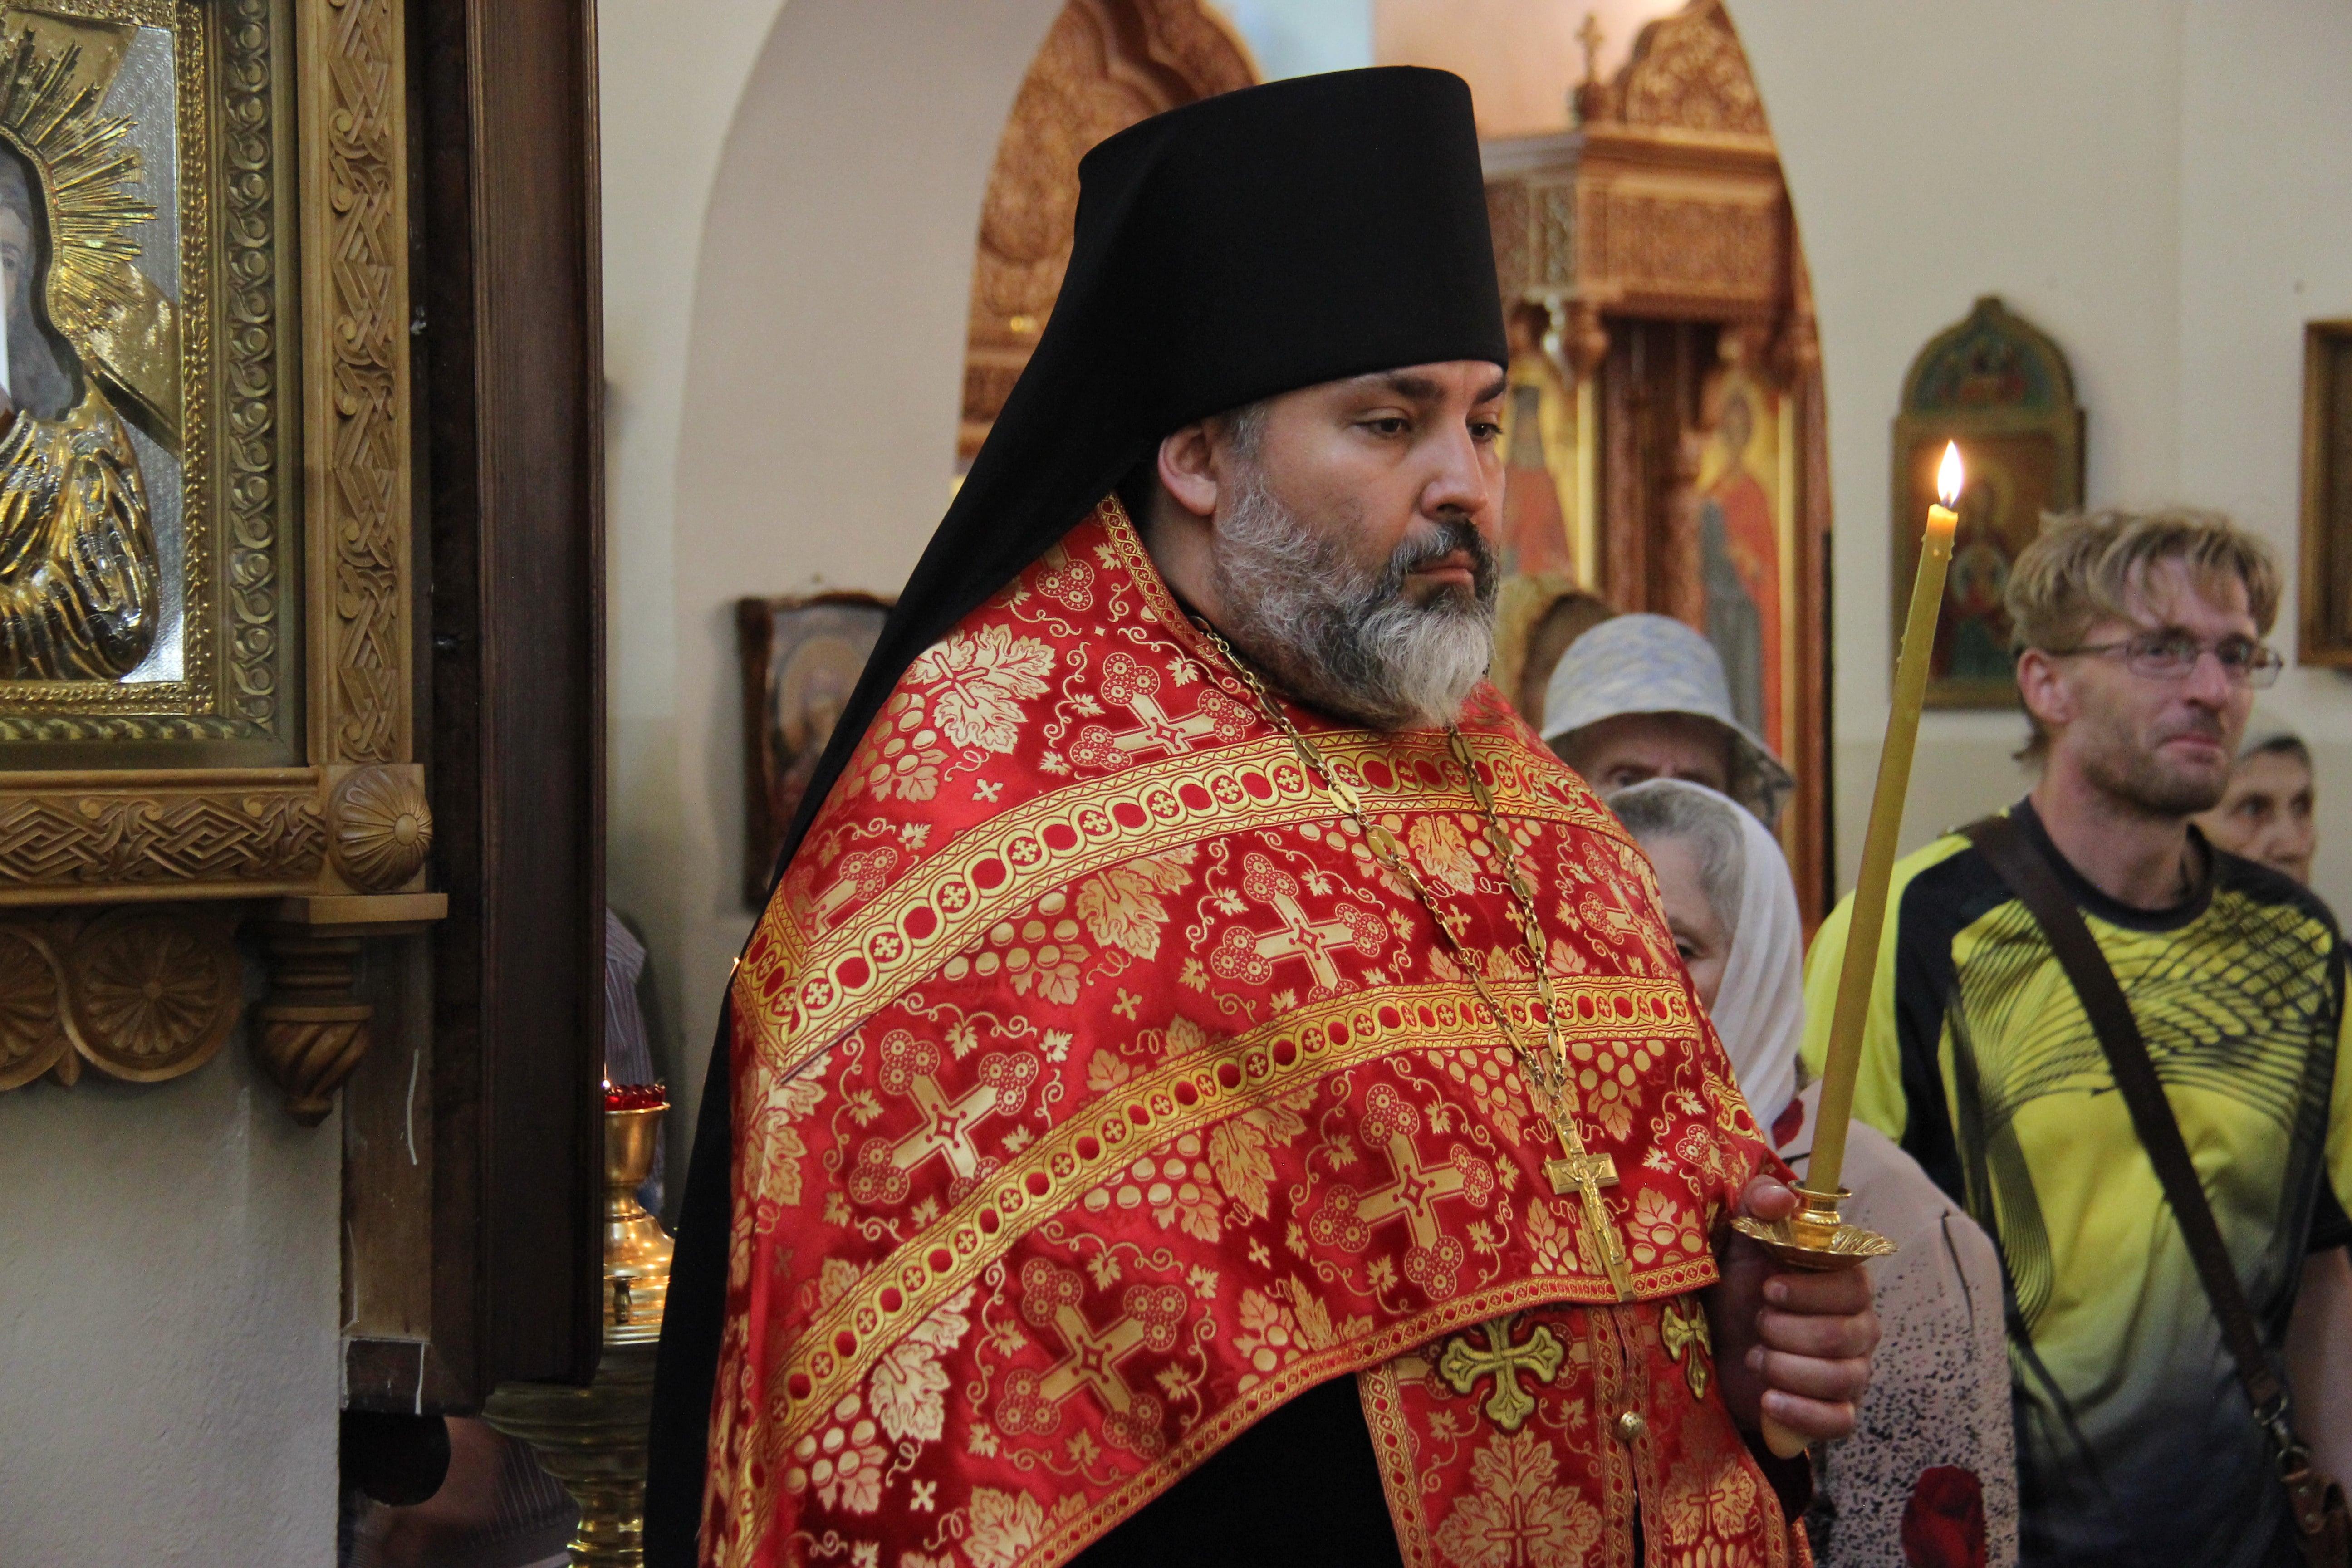 http://monuspen.ru/photoreports/f0fd1d8b1ea6bf9e46e234a1b58ab429.JPG